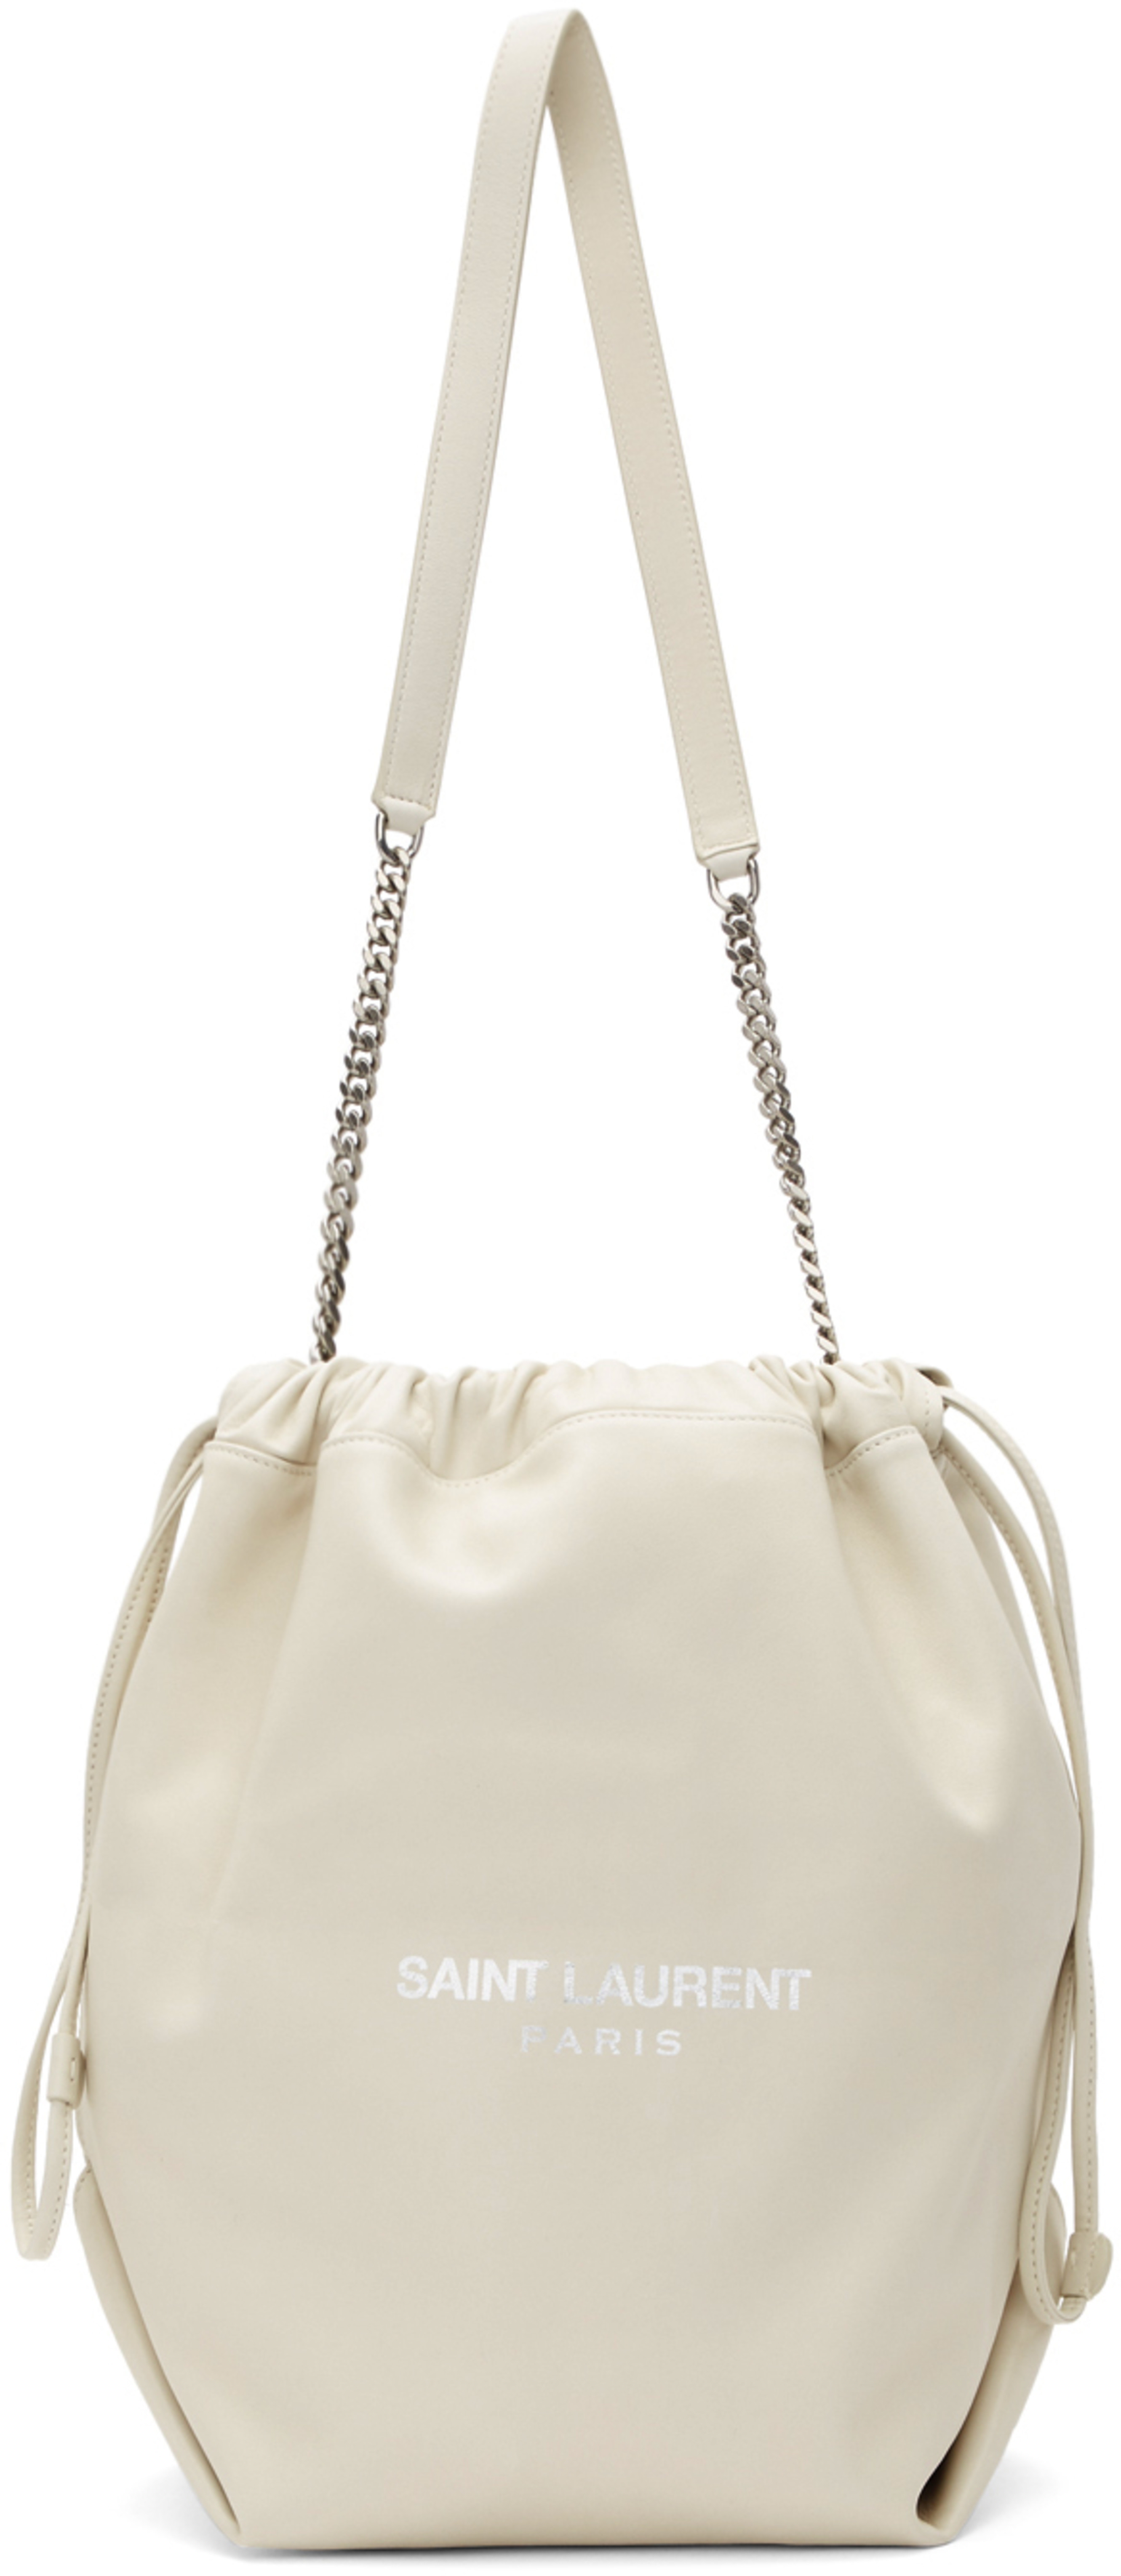 2edb65c477 Saint Laurent shoulder bags for Women